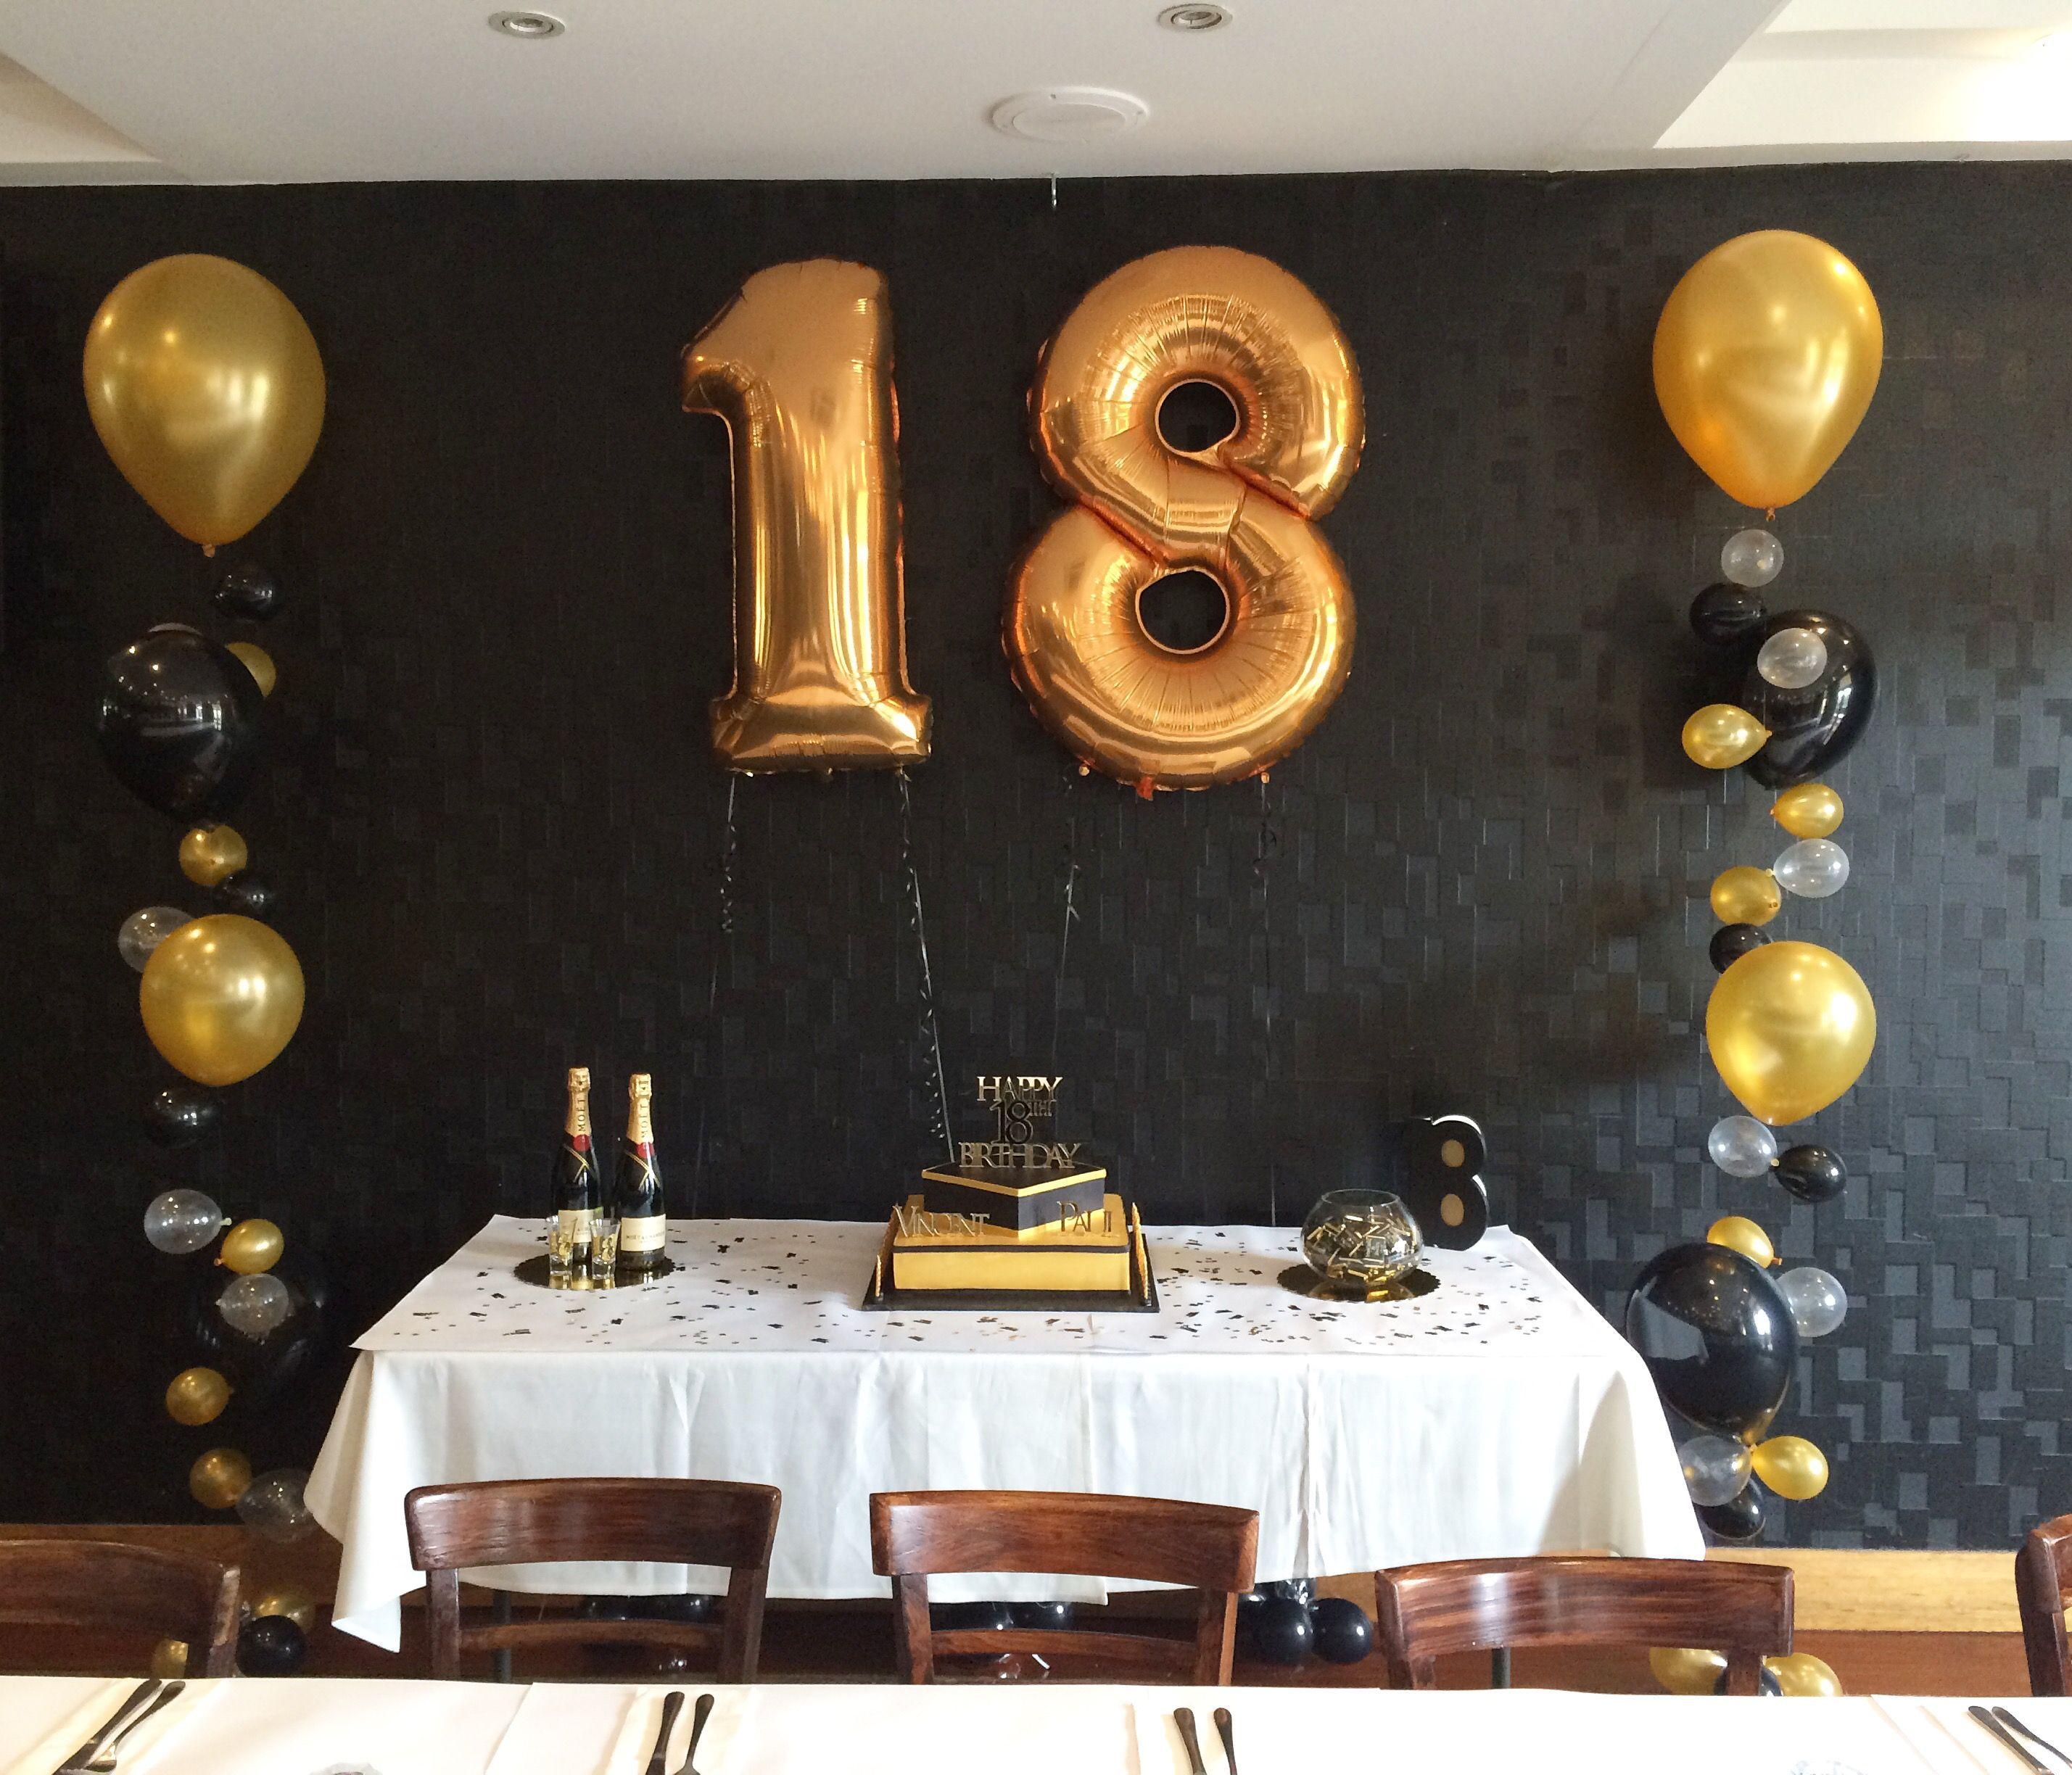 18th Birthday Party Decorations Deco Anniversaire 18 Ans Deco